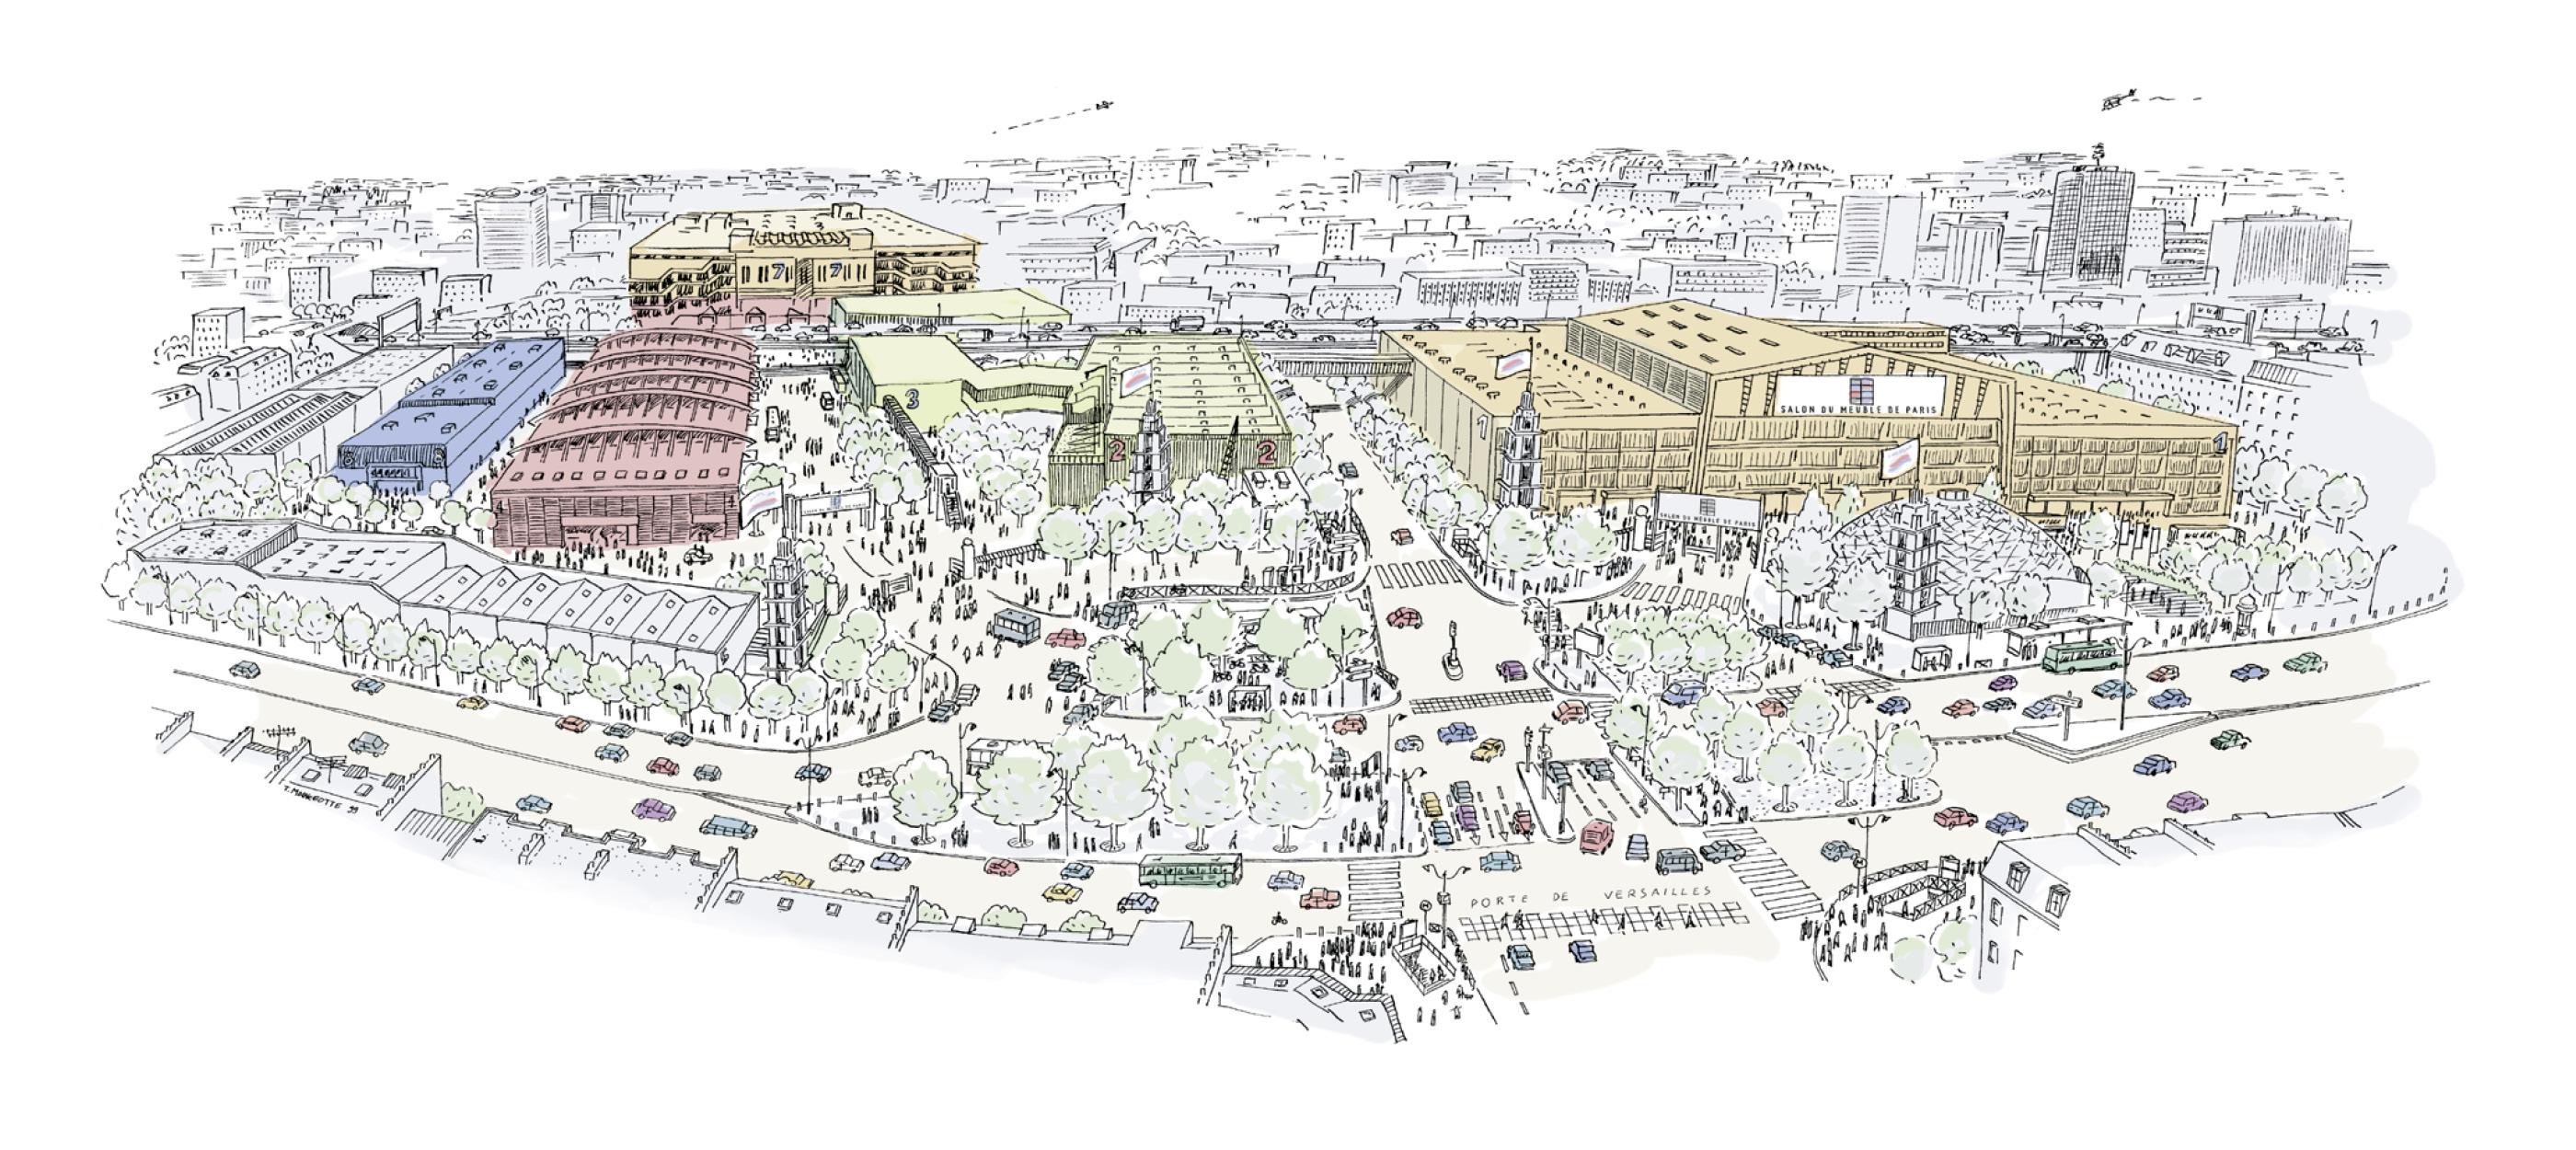 Dessin Paris Expo Porte de Versailles